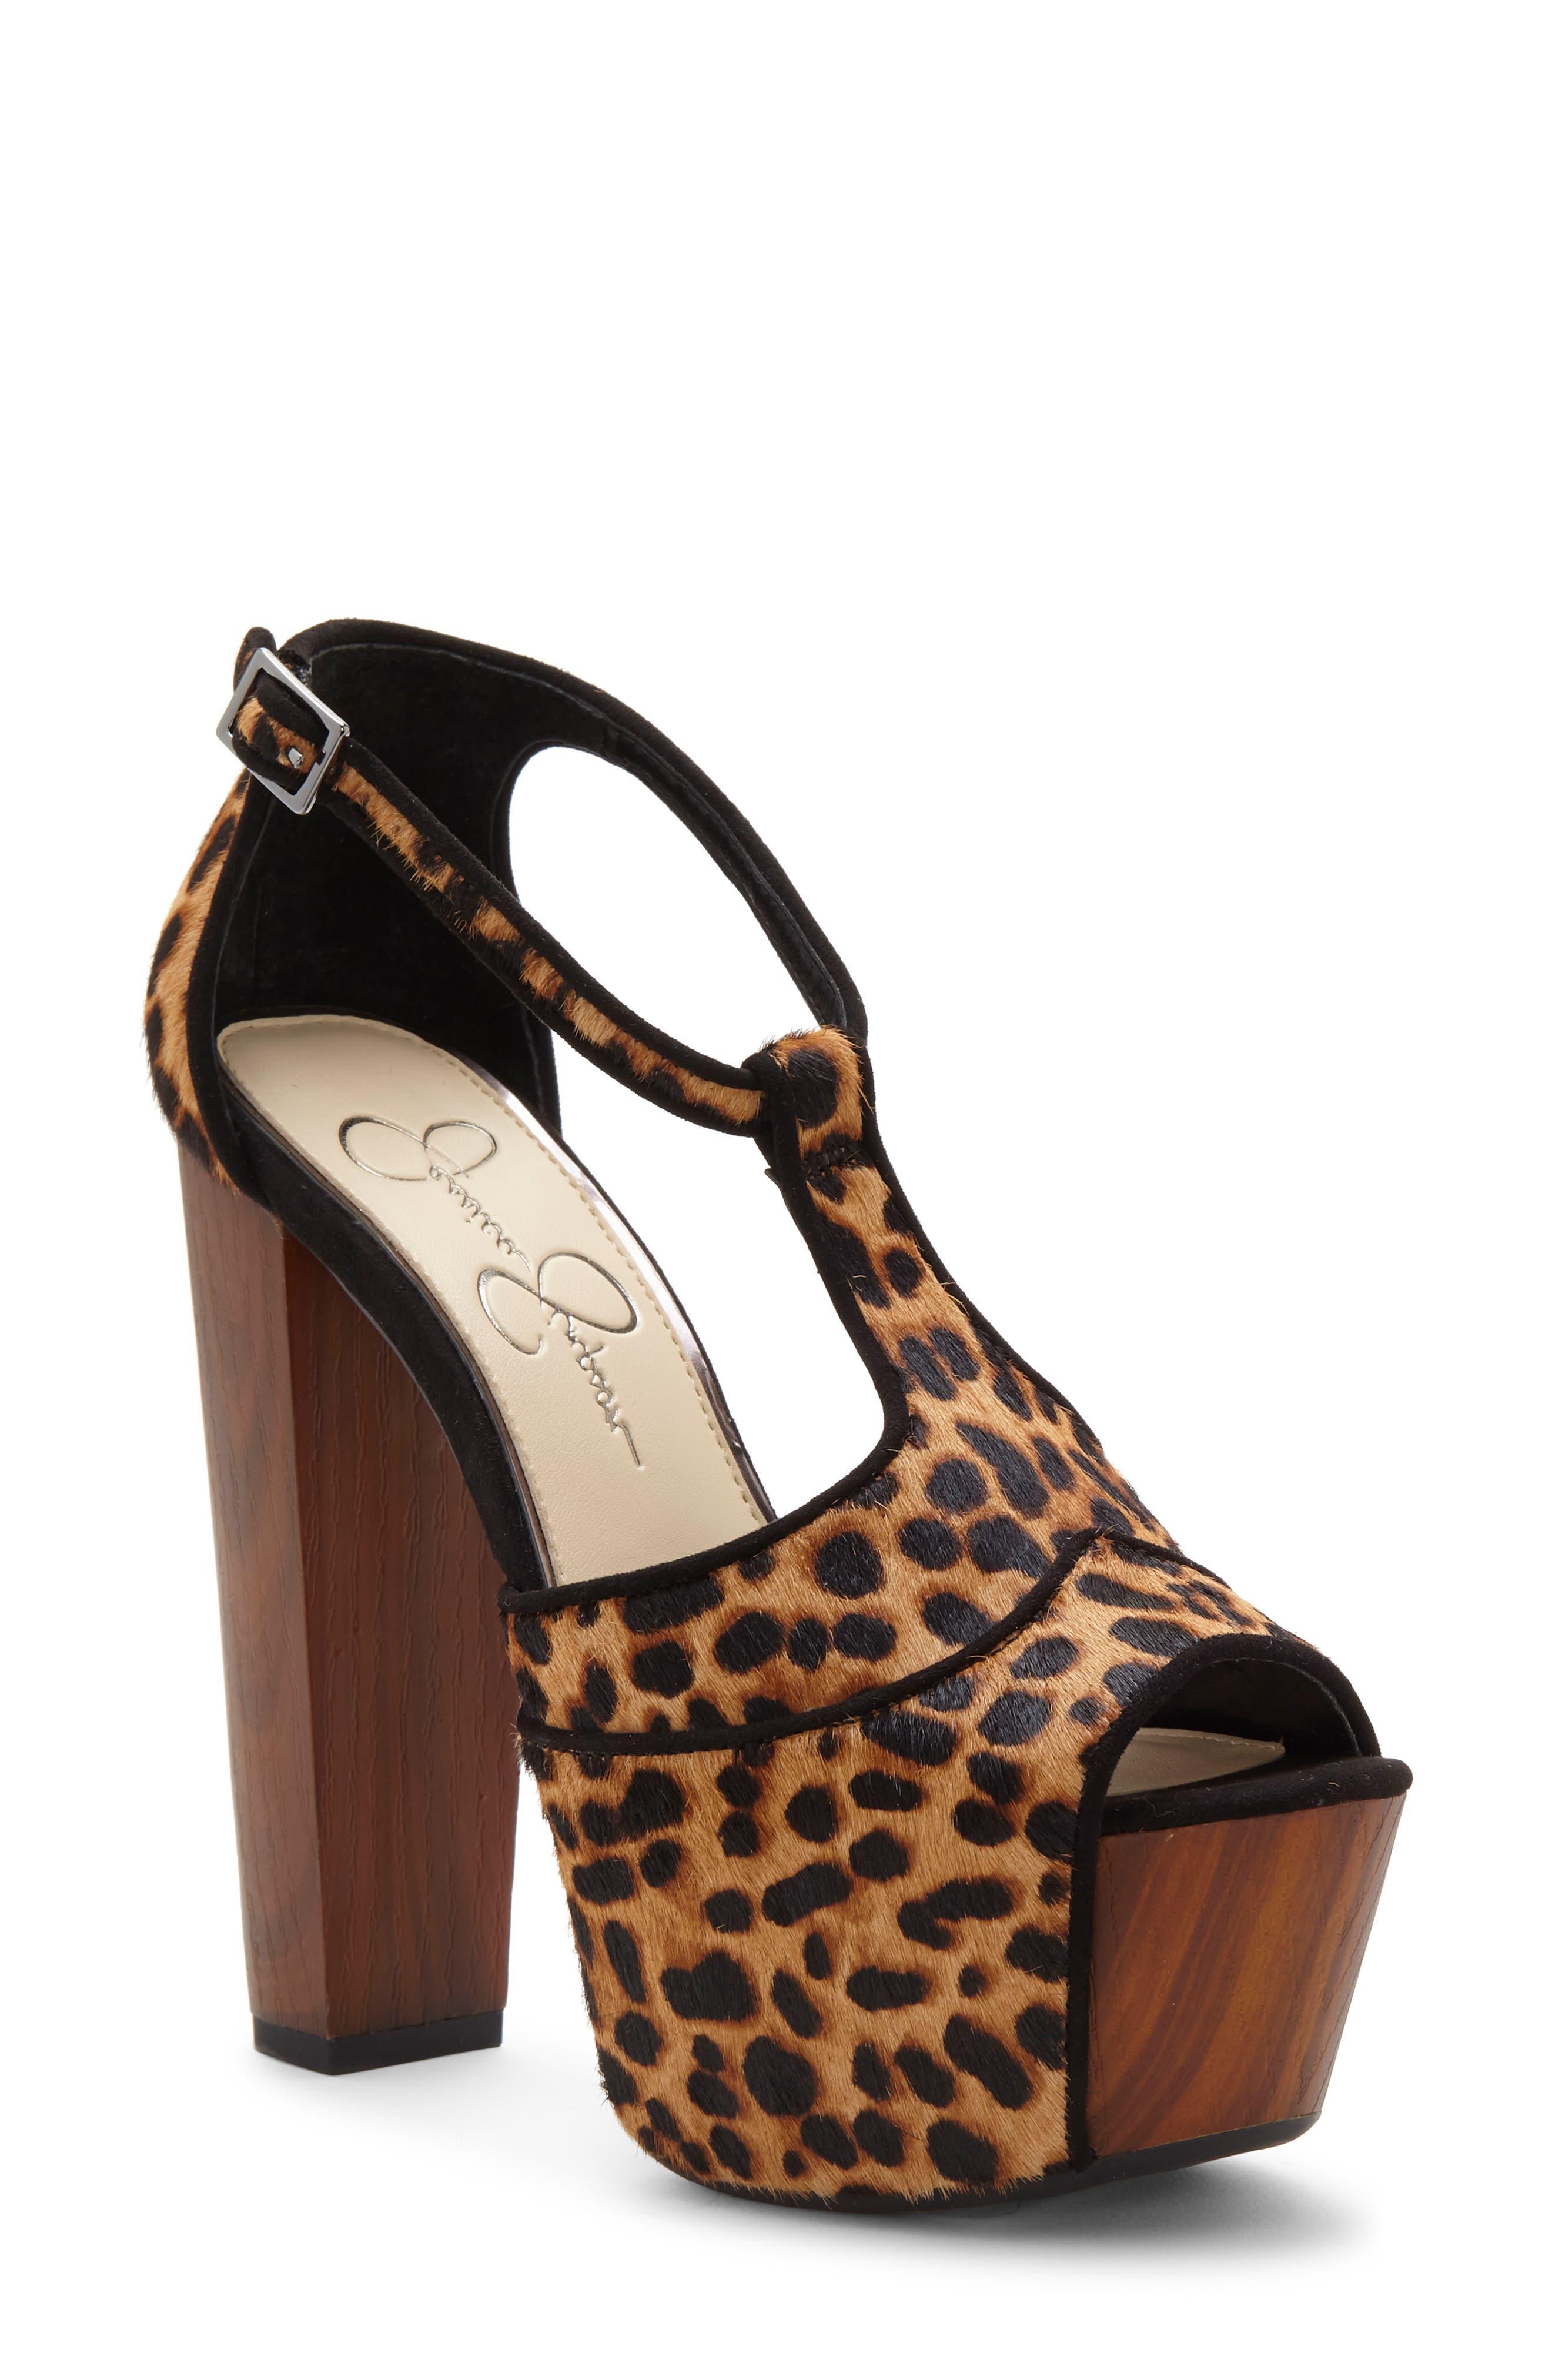 bbdfce6187 Women's Jessica Simpson Sandals